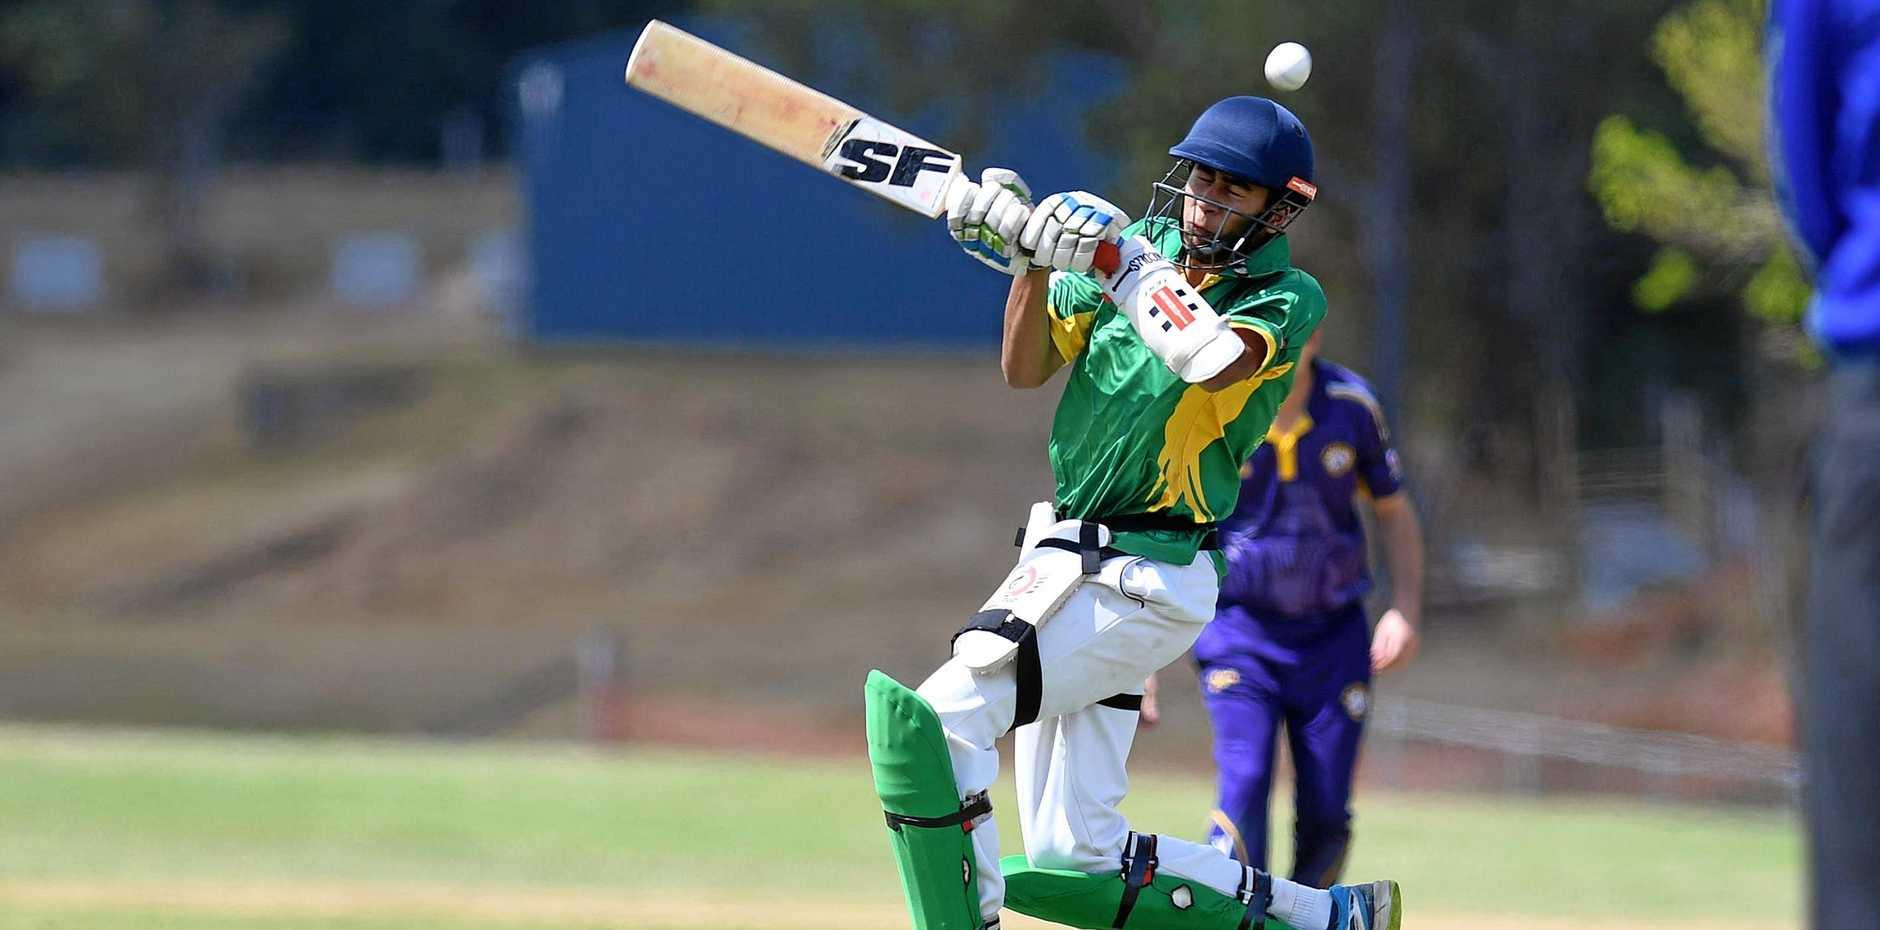 Gympie Cricket at One Mile Valleys V Wests - Lovedeep Singh